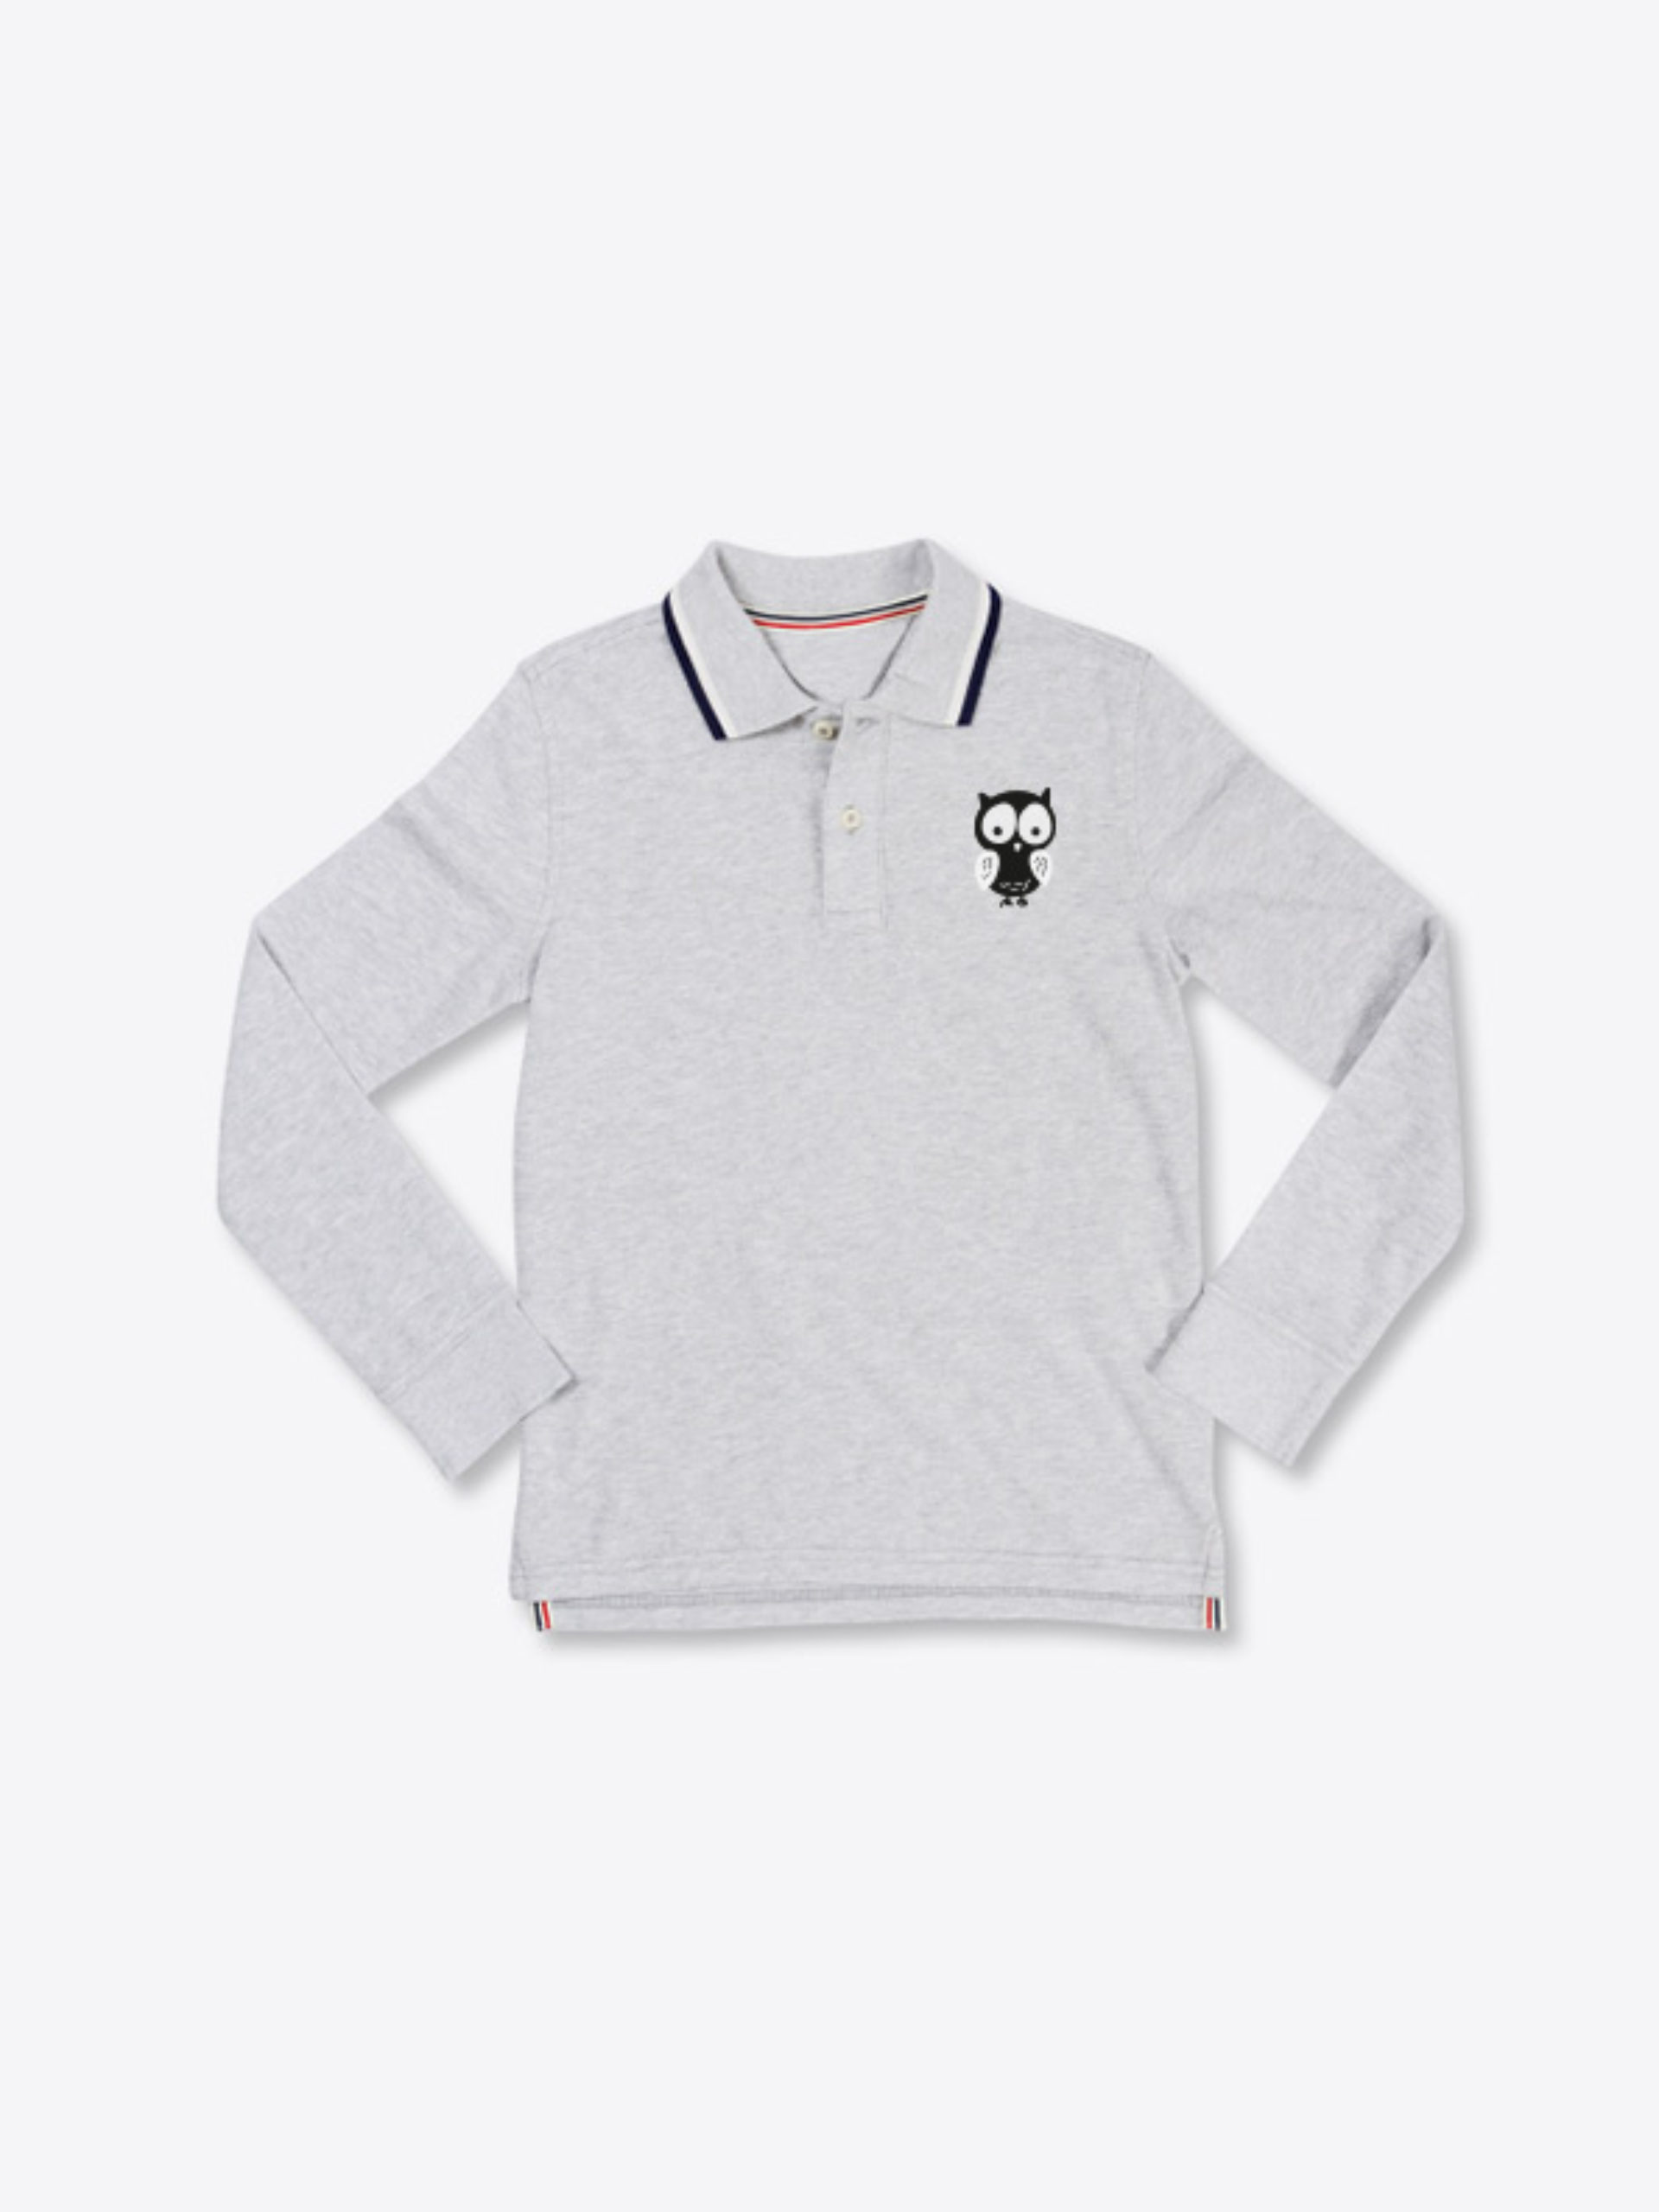 Kinder Polo Shirt Langarm Mit Logo Drucken